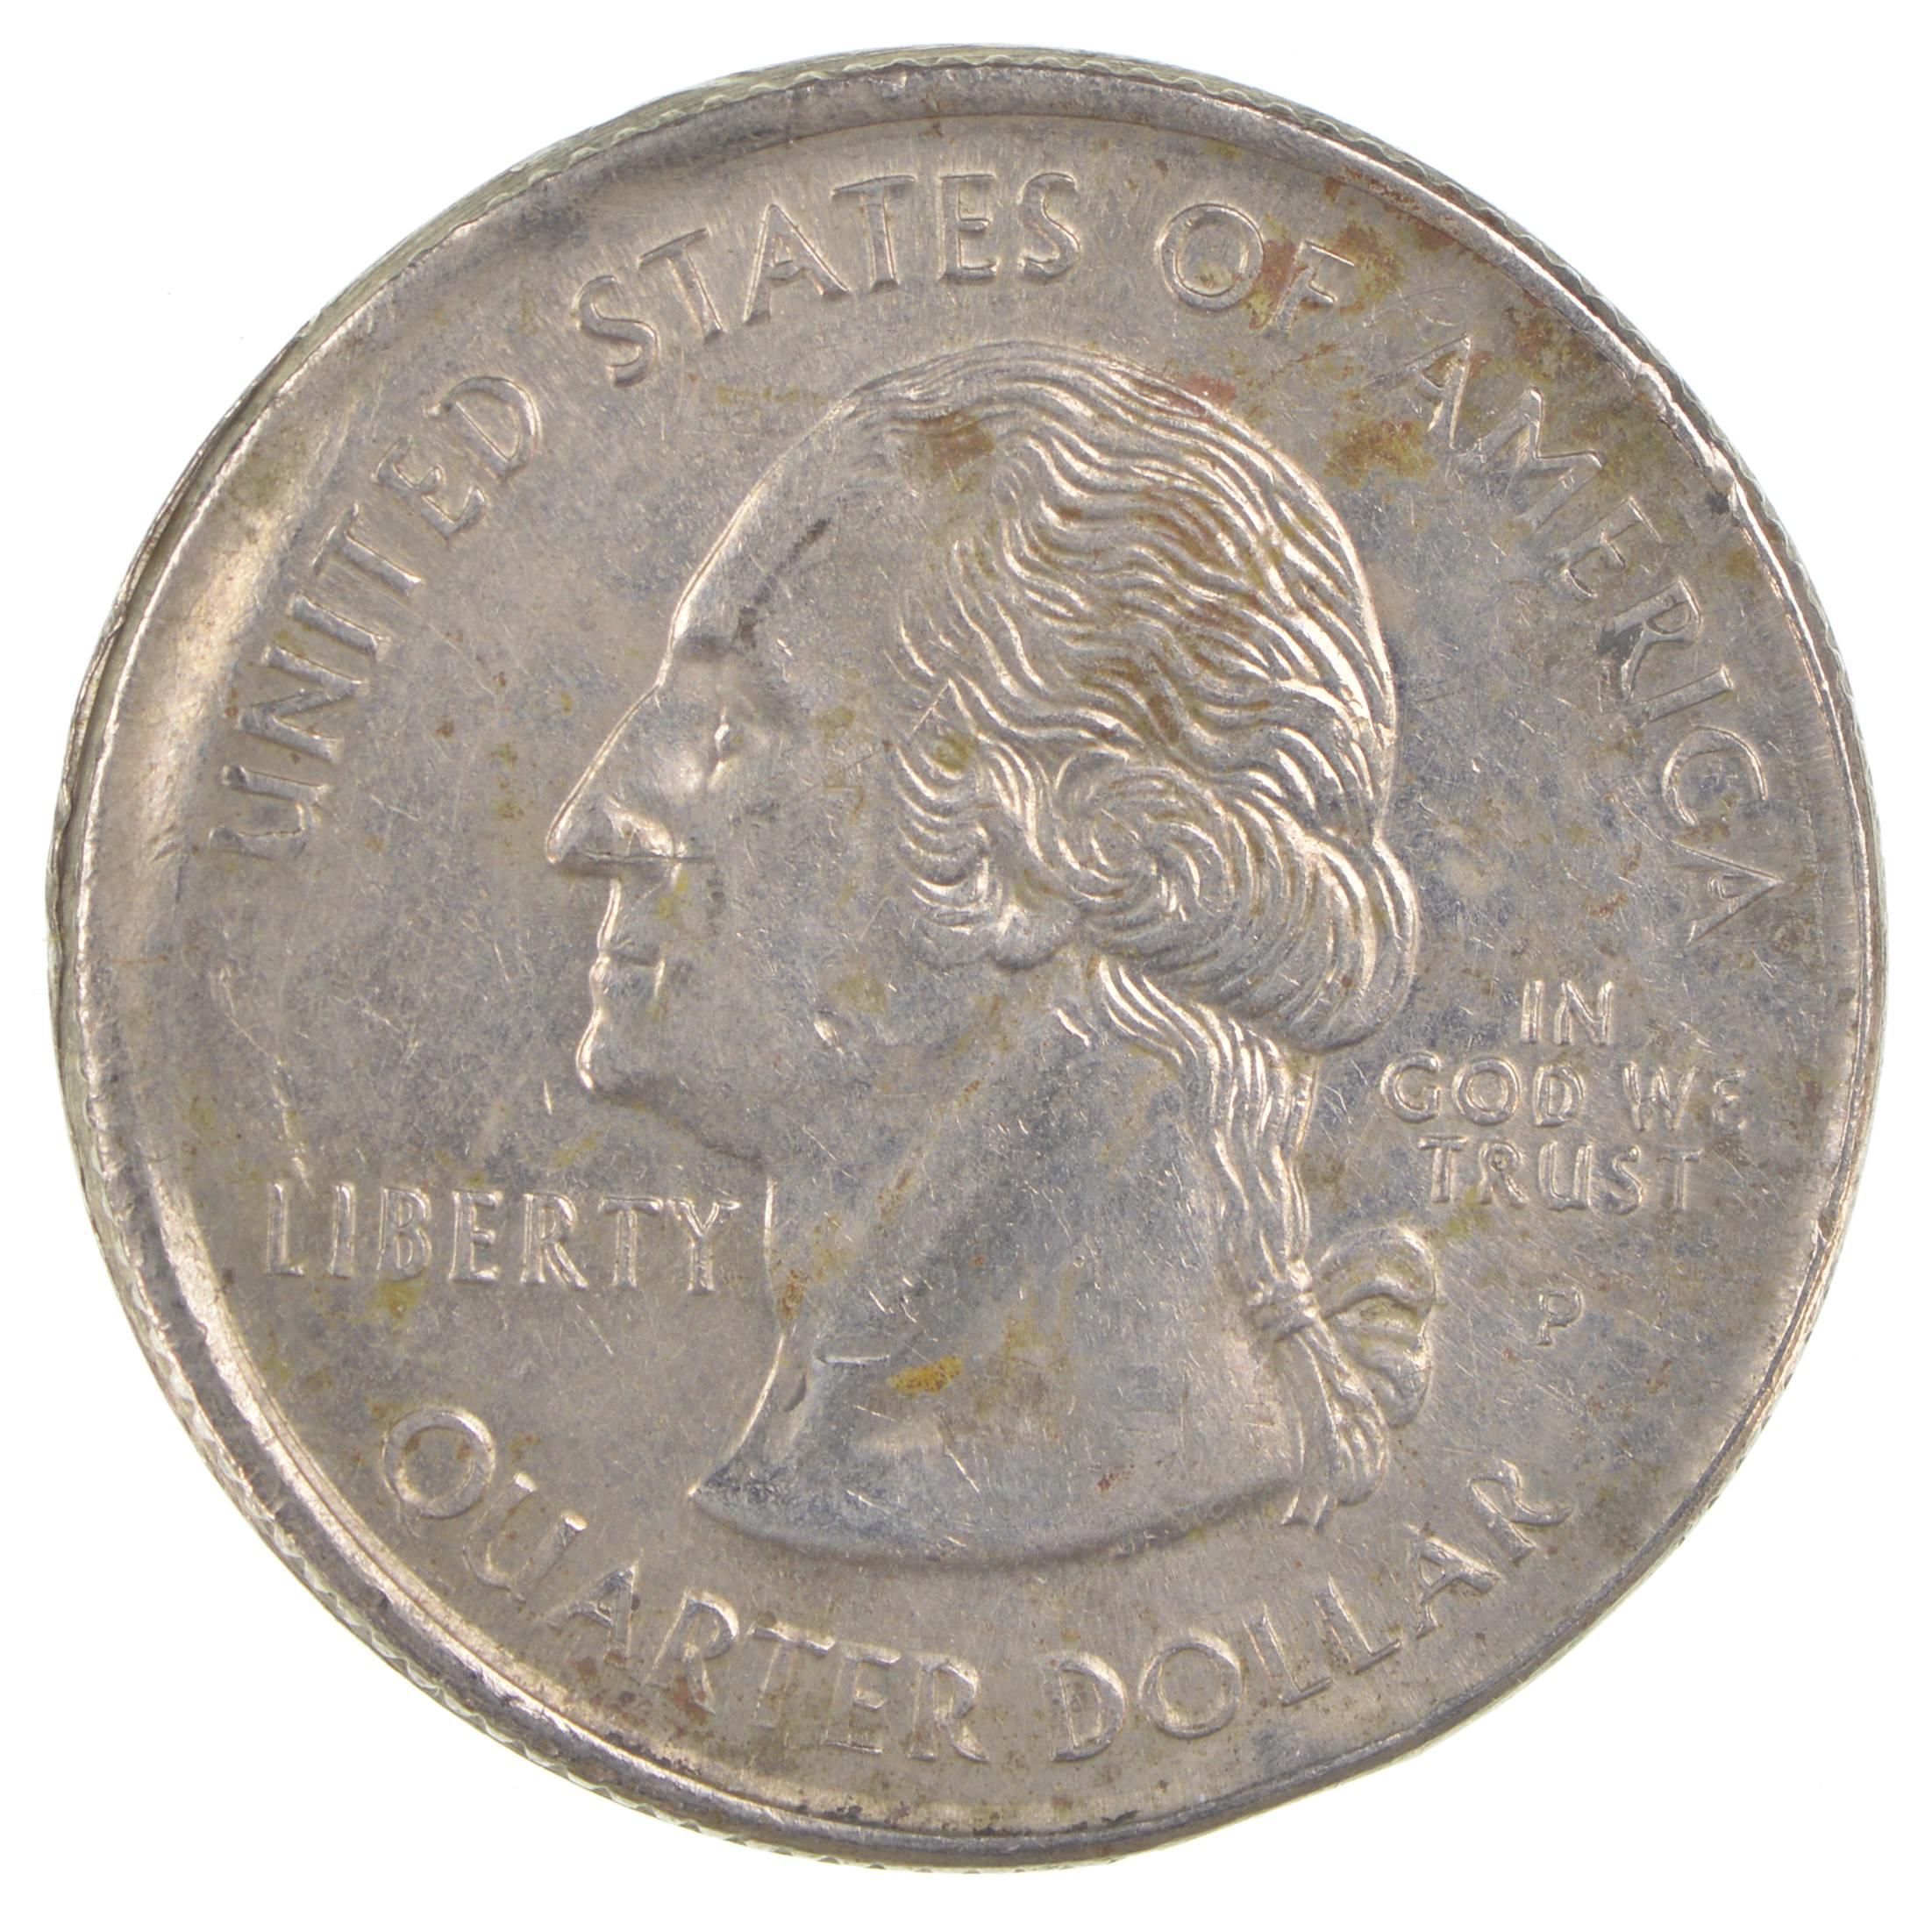 **FREE SHIPPING** 1999 P /& D Connecticut Quarter Coin Set 2 Coins